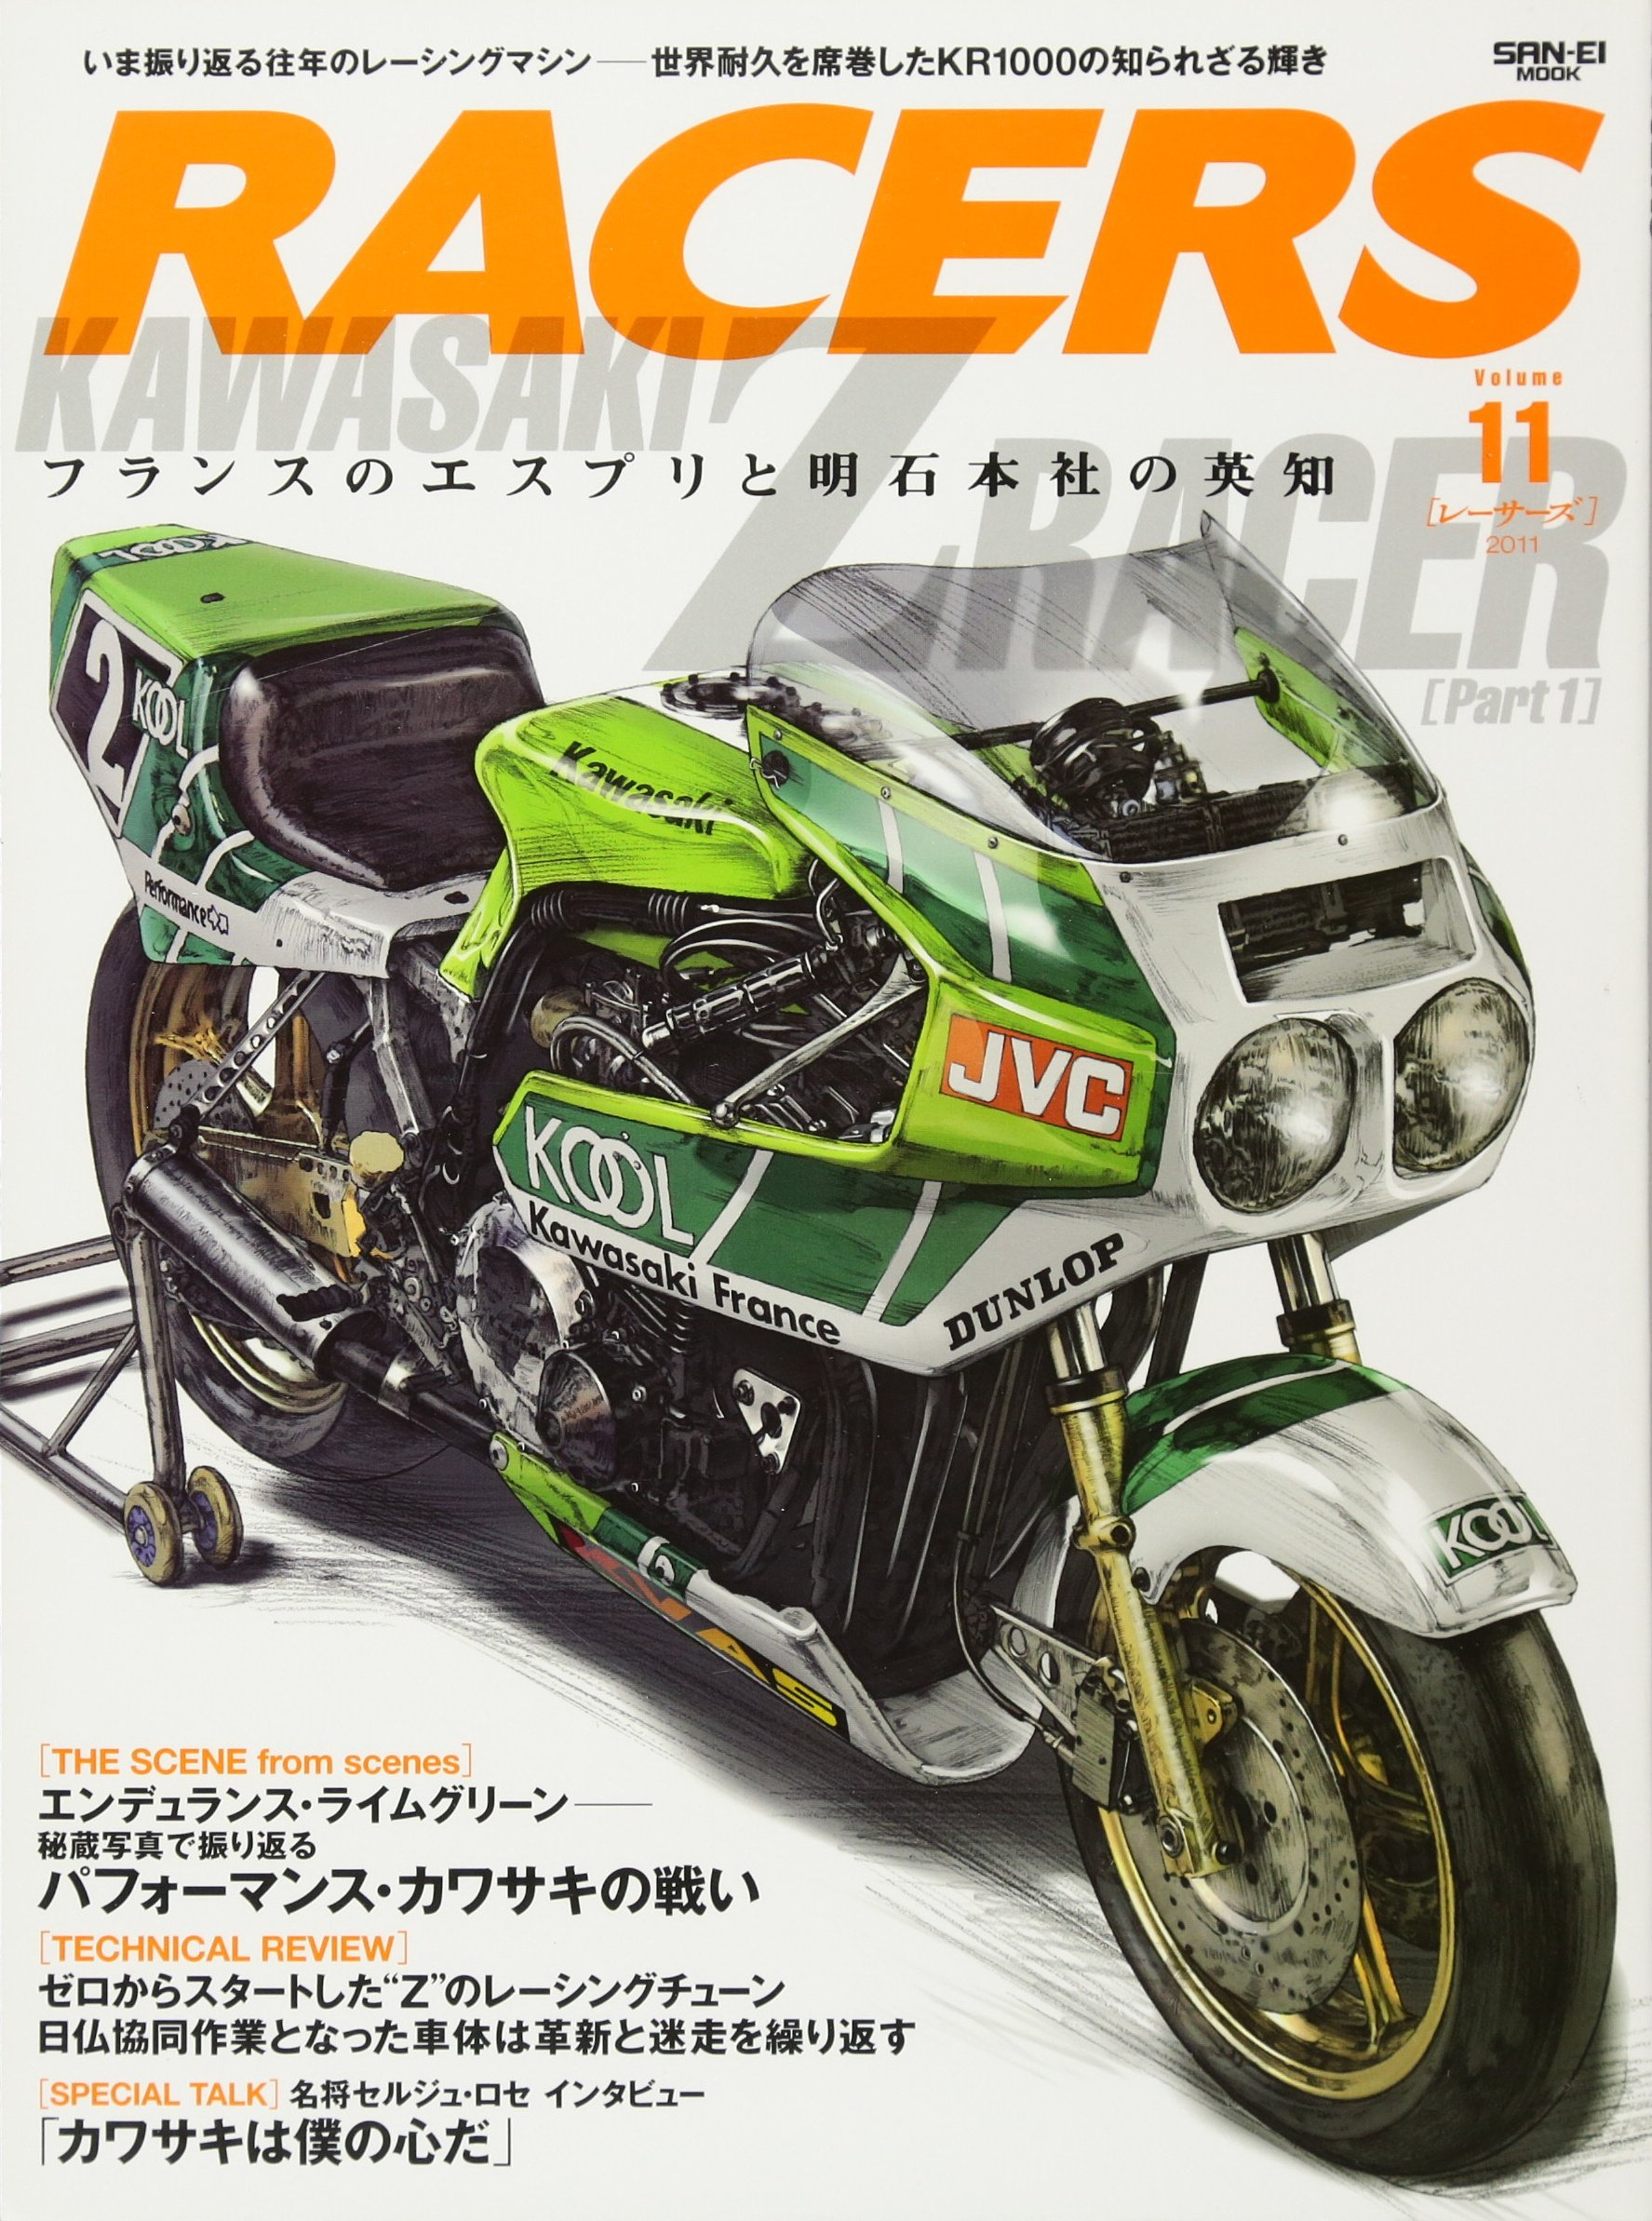 Performance Kawasaki Endurance racing KR1000